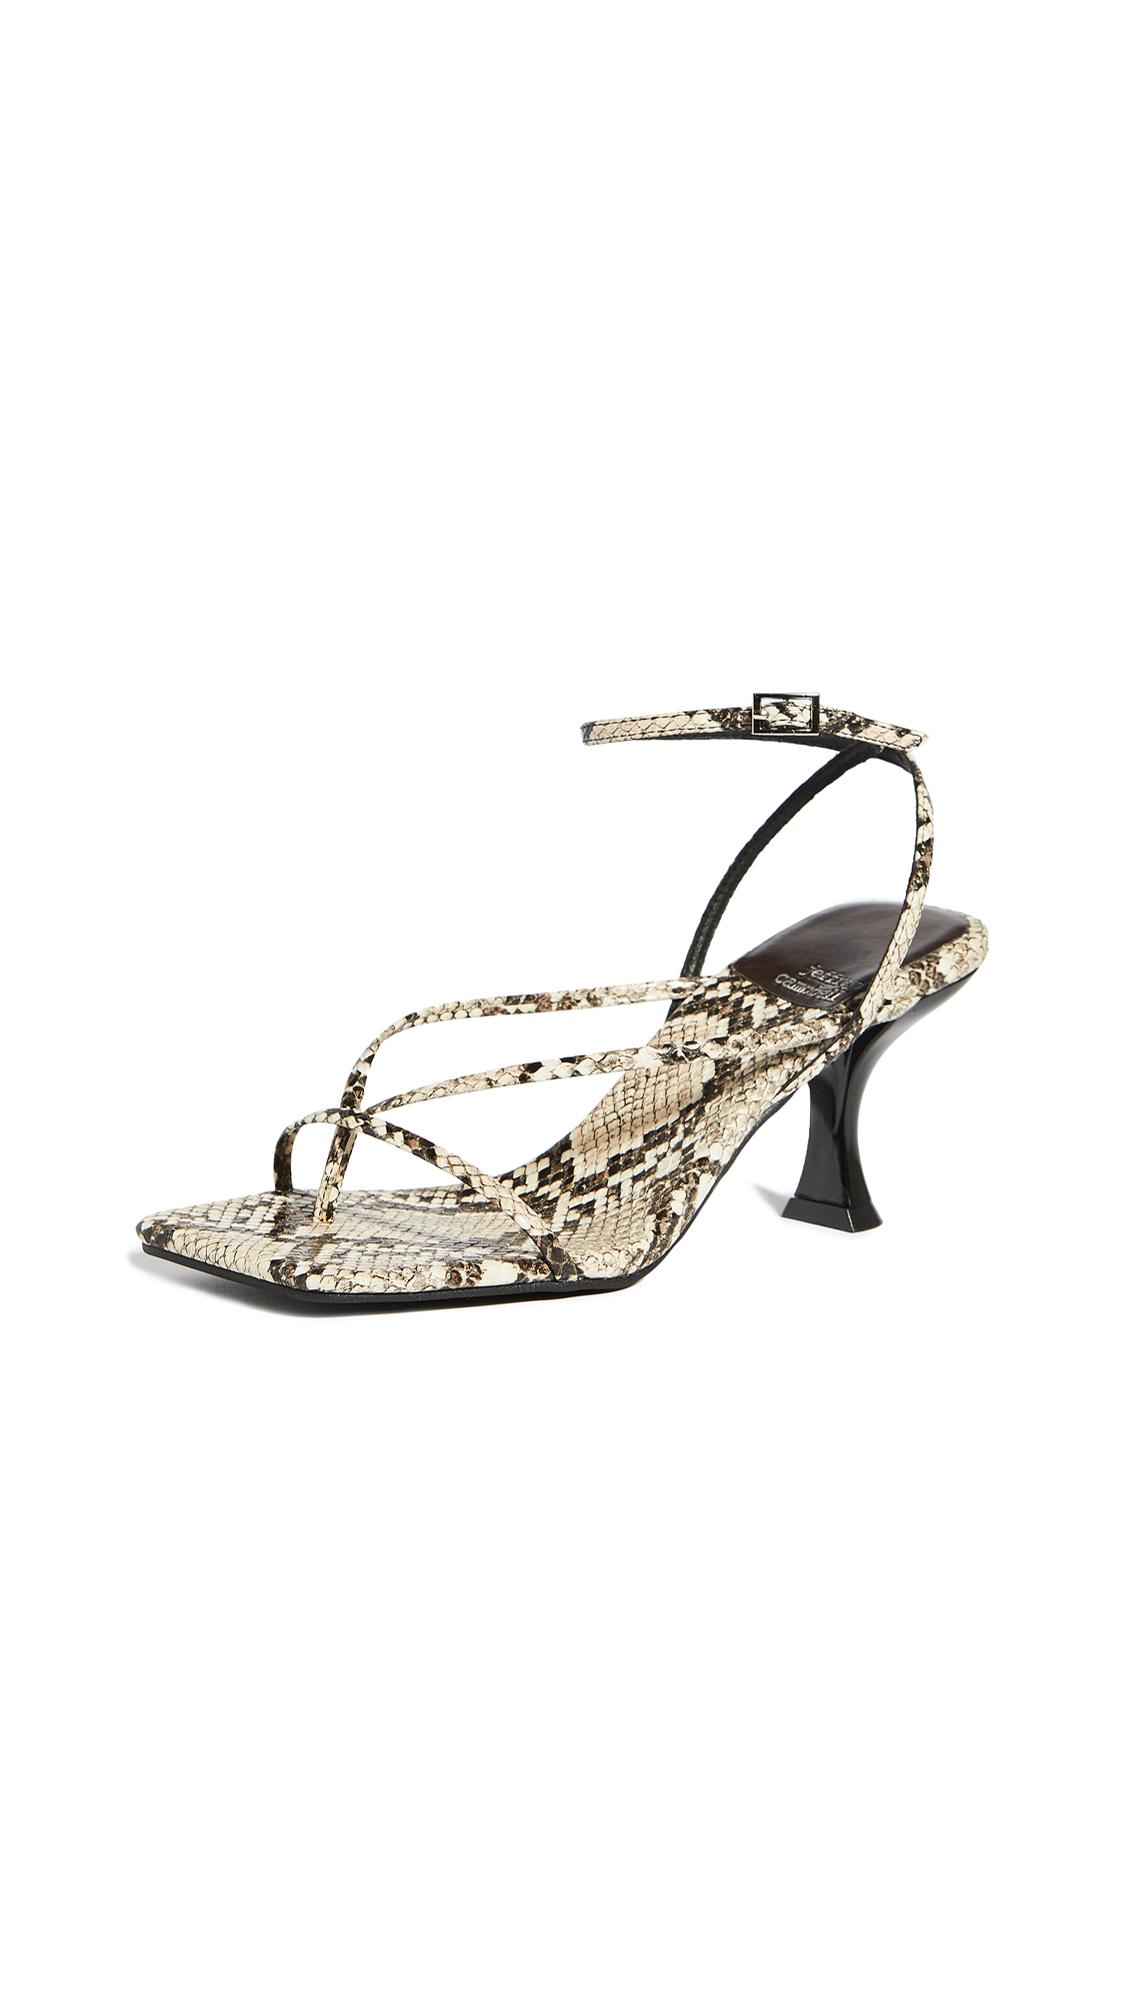 Jeffrey Campbell Fluxx Strappy Sandals